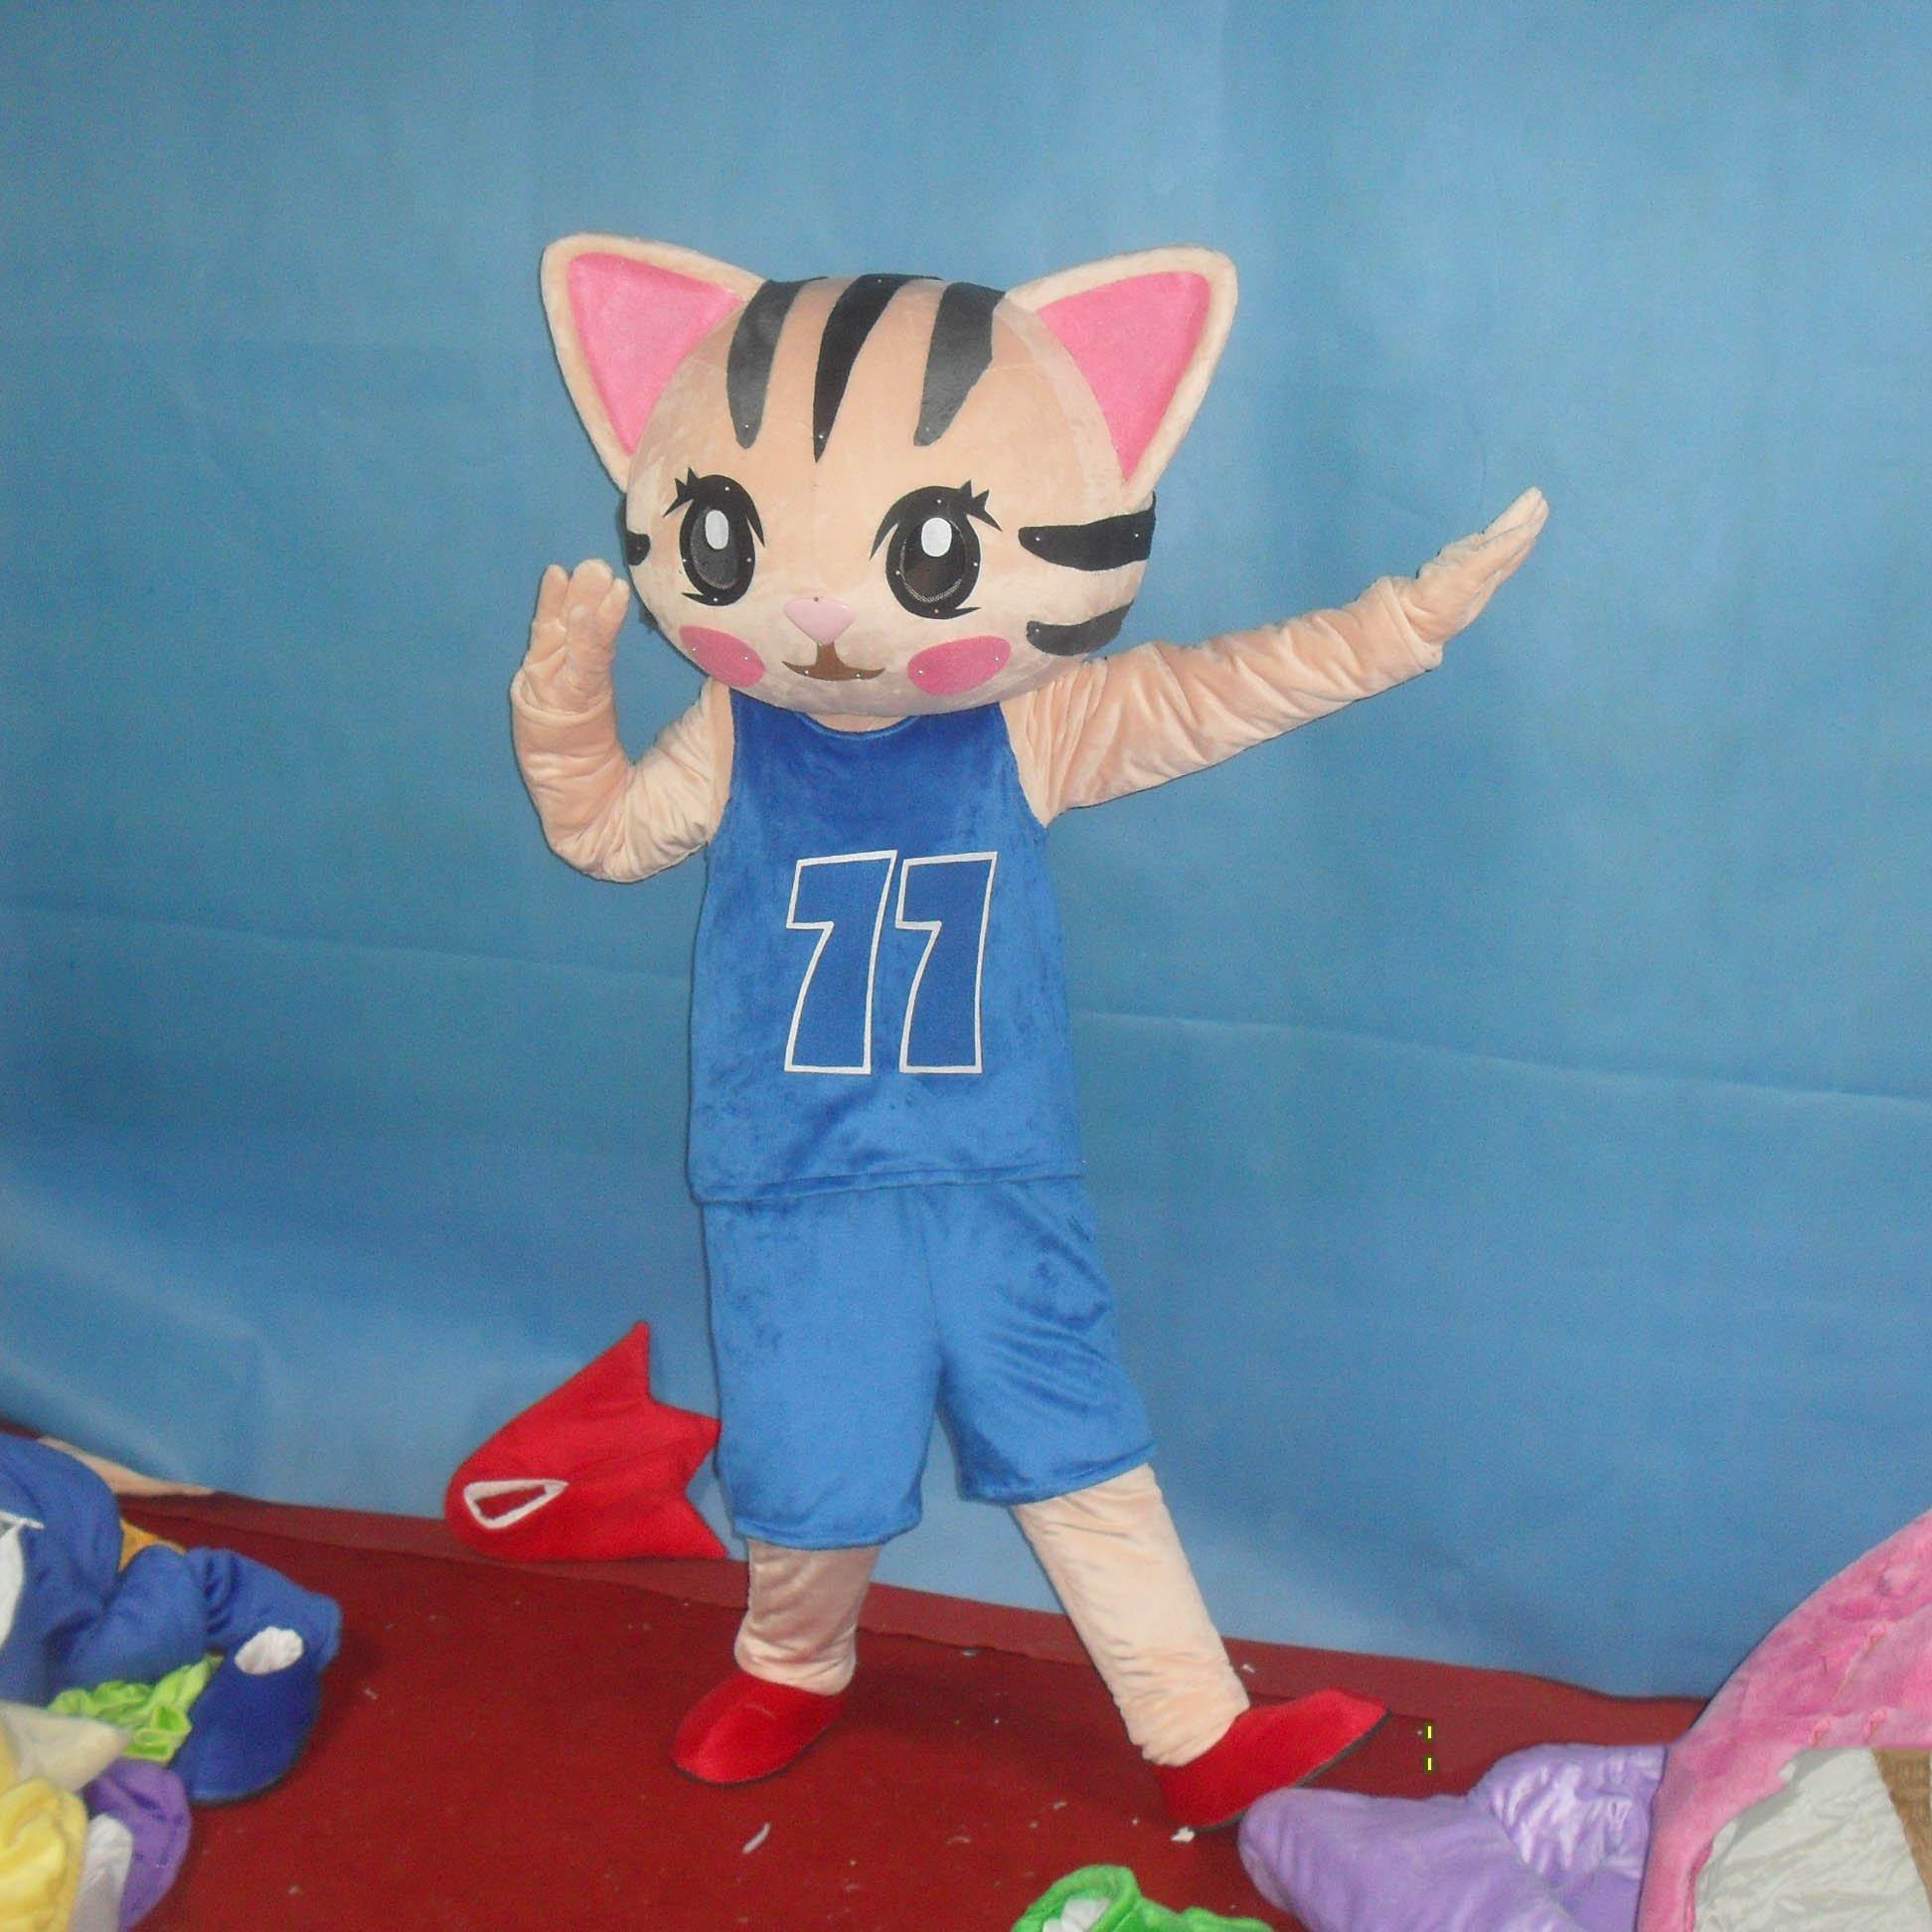 Cute Kitten Cartoon Doll Clothing Cartoon Walking Doll Clothing Cartoon Show Clothing Doll Clothes Mascot Costume